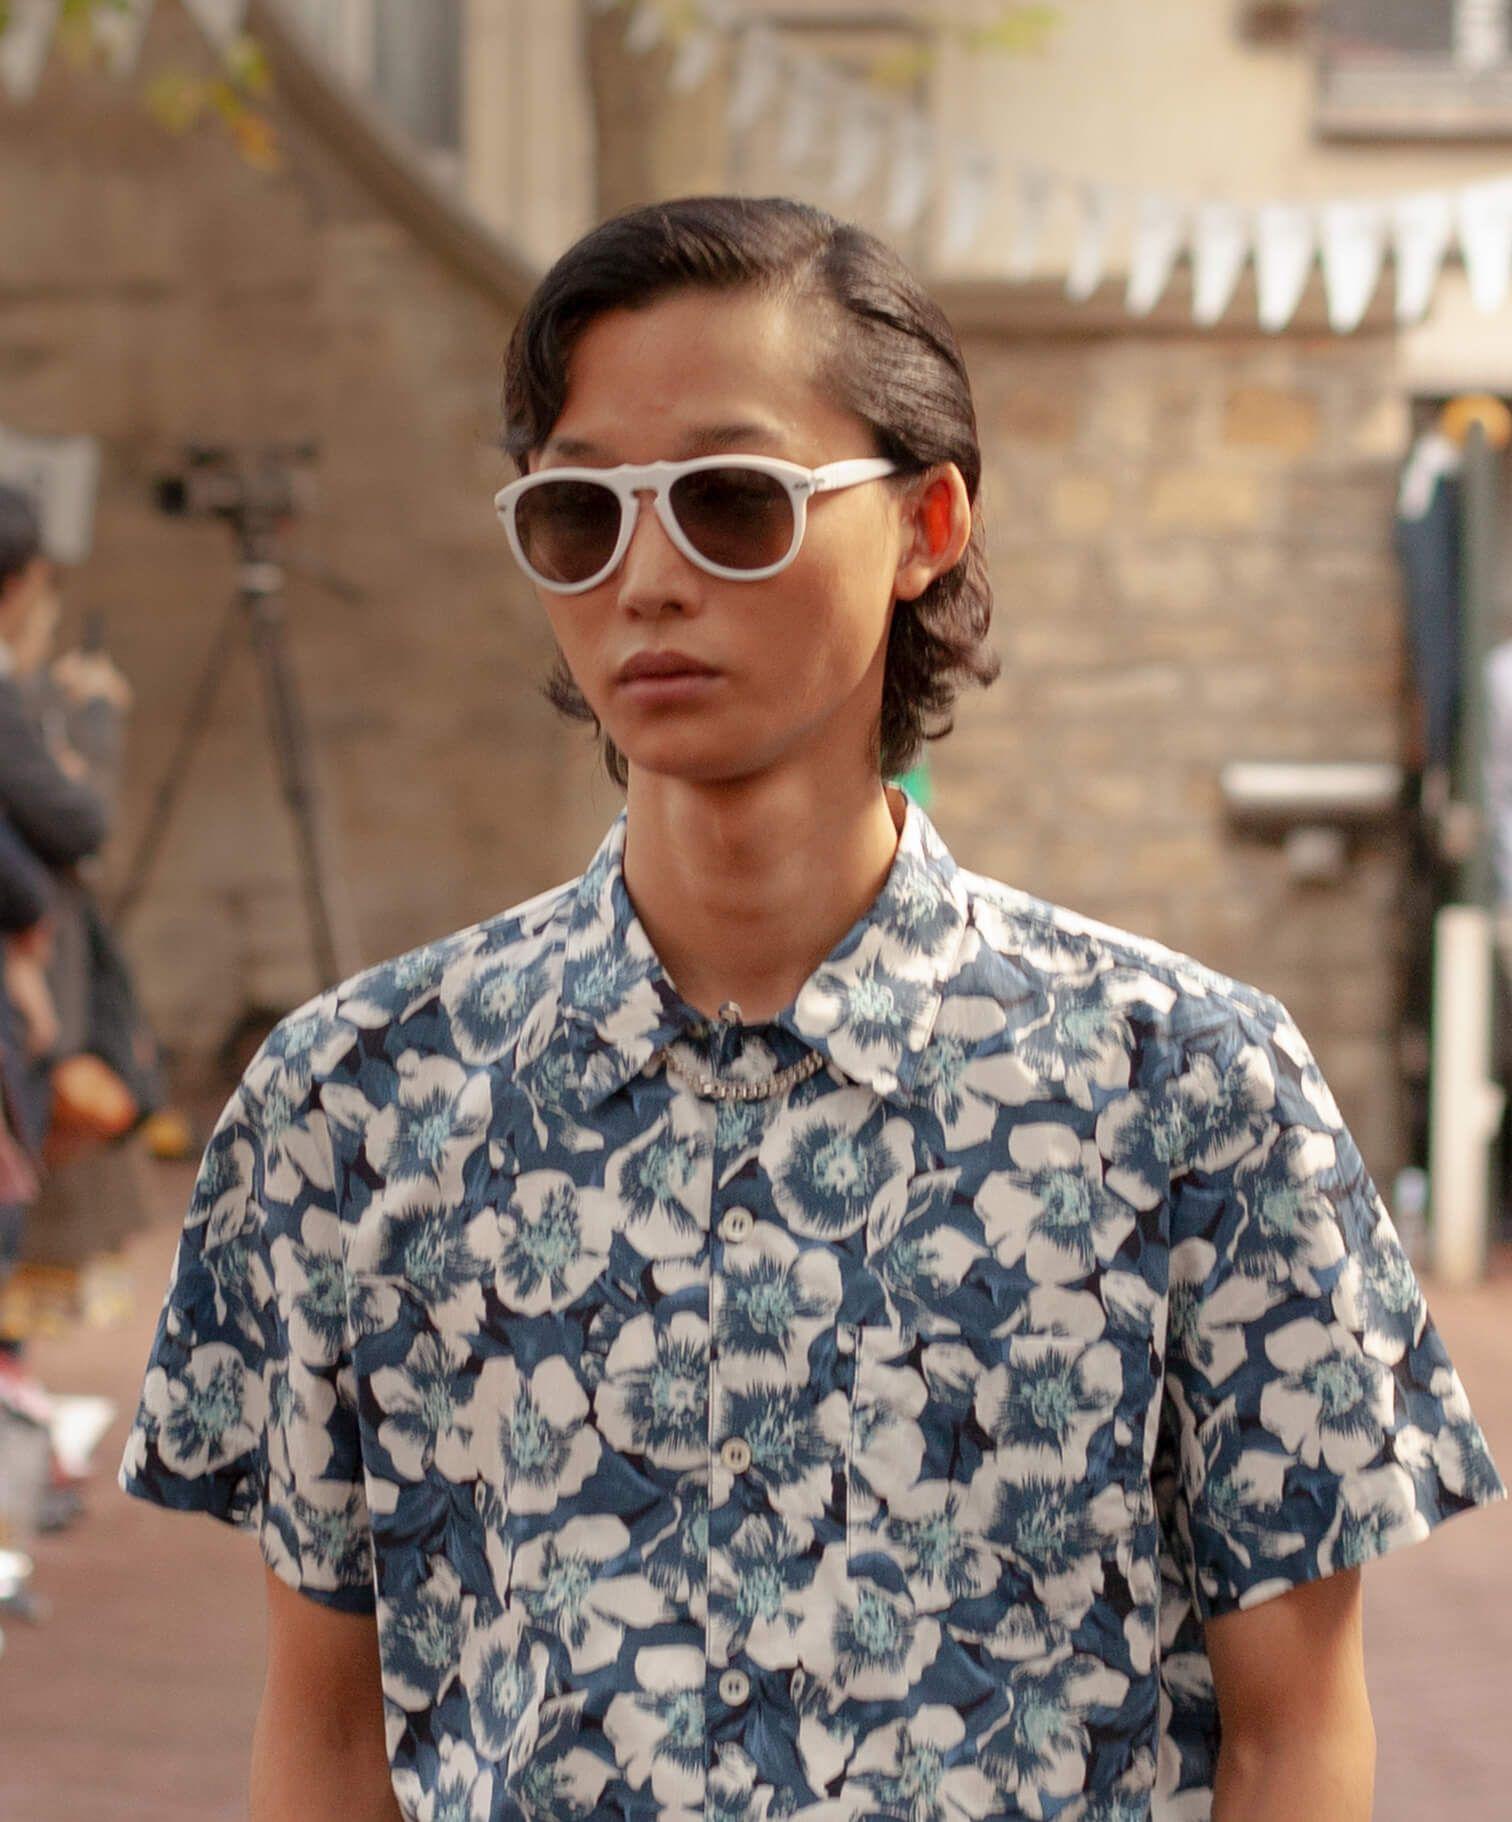 white sunglasses image hover